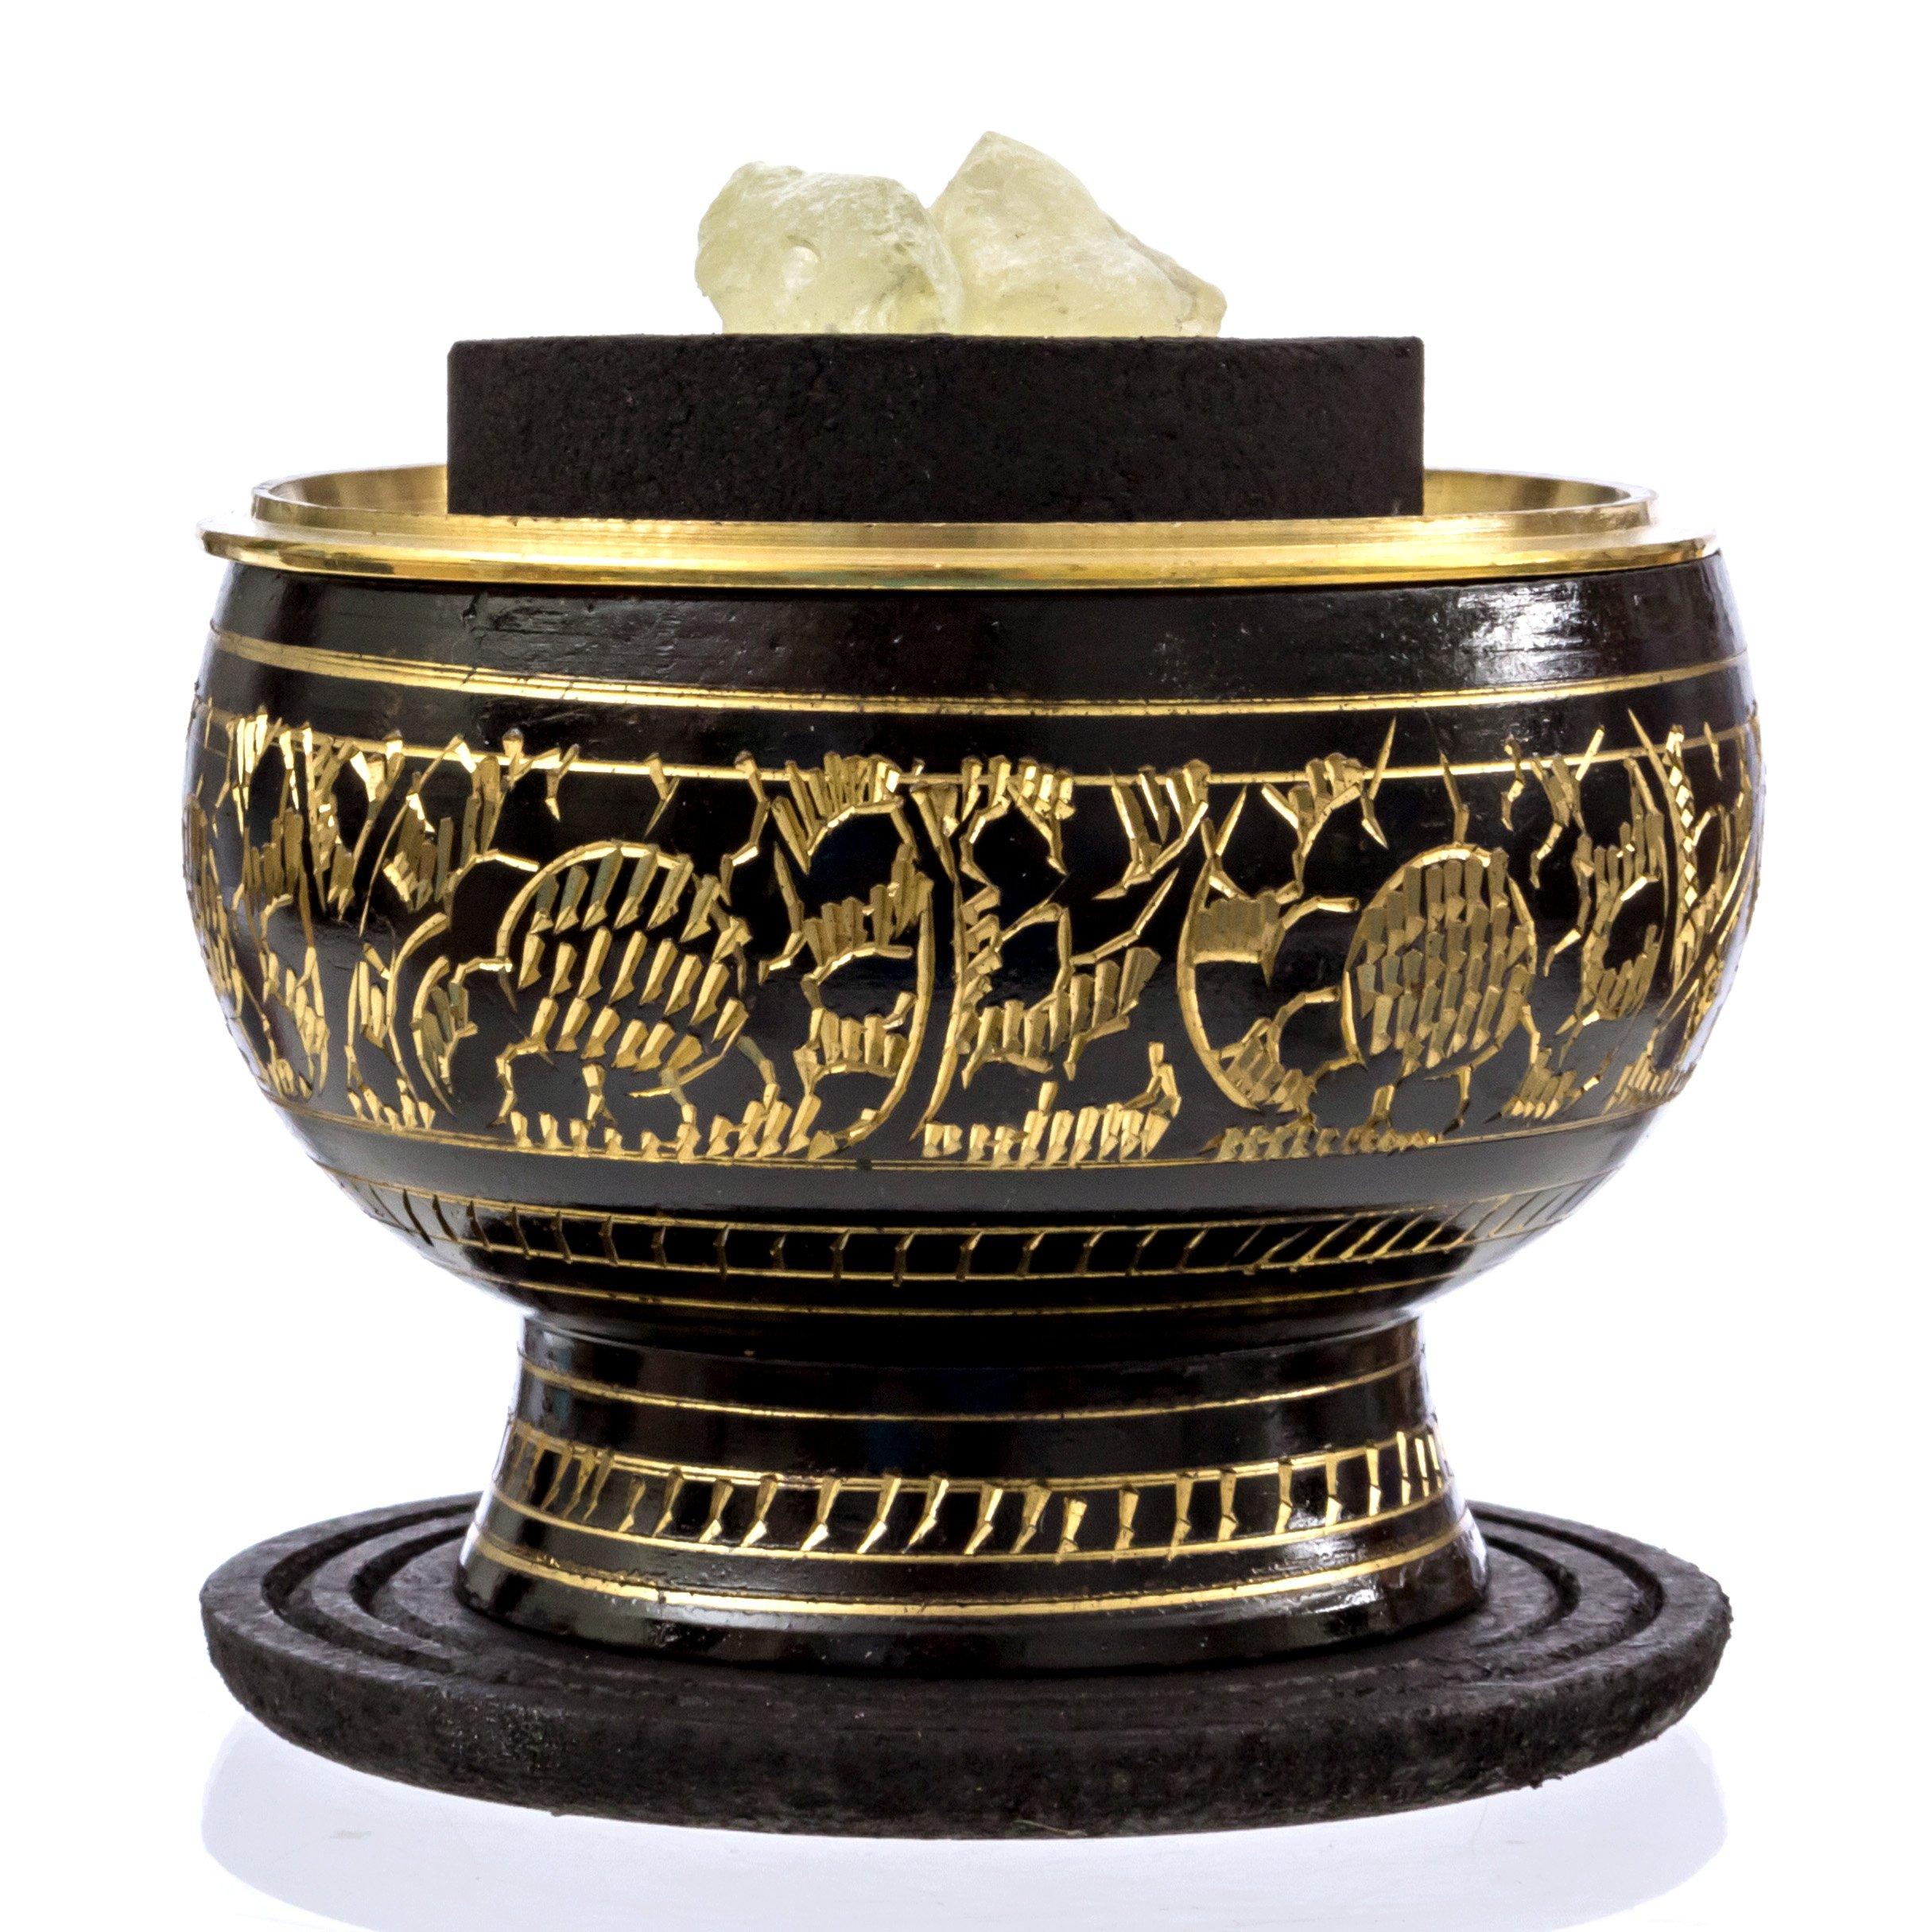 Alternative Imagination Premium Copal Burning Kit (with Tibetan Incense Burner or Brass Screen Burner) (Black Brass) by Alternative Imagination (Image #2)